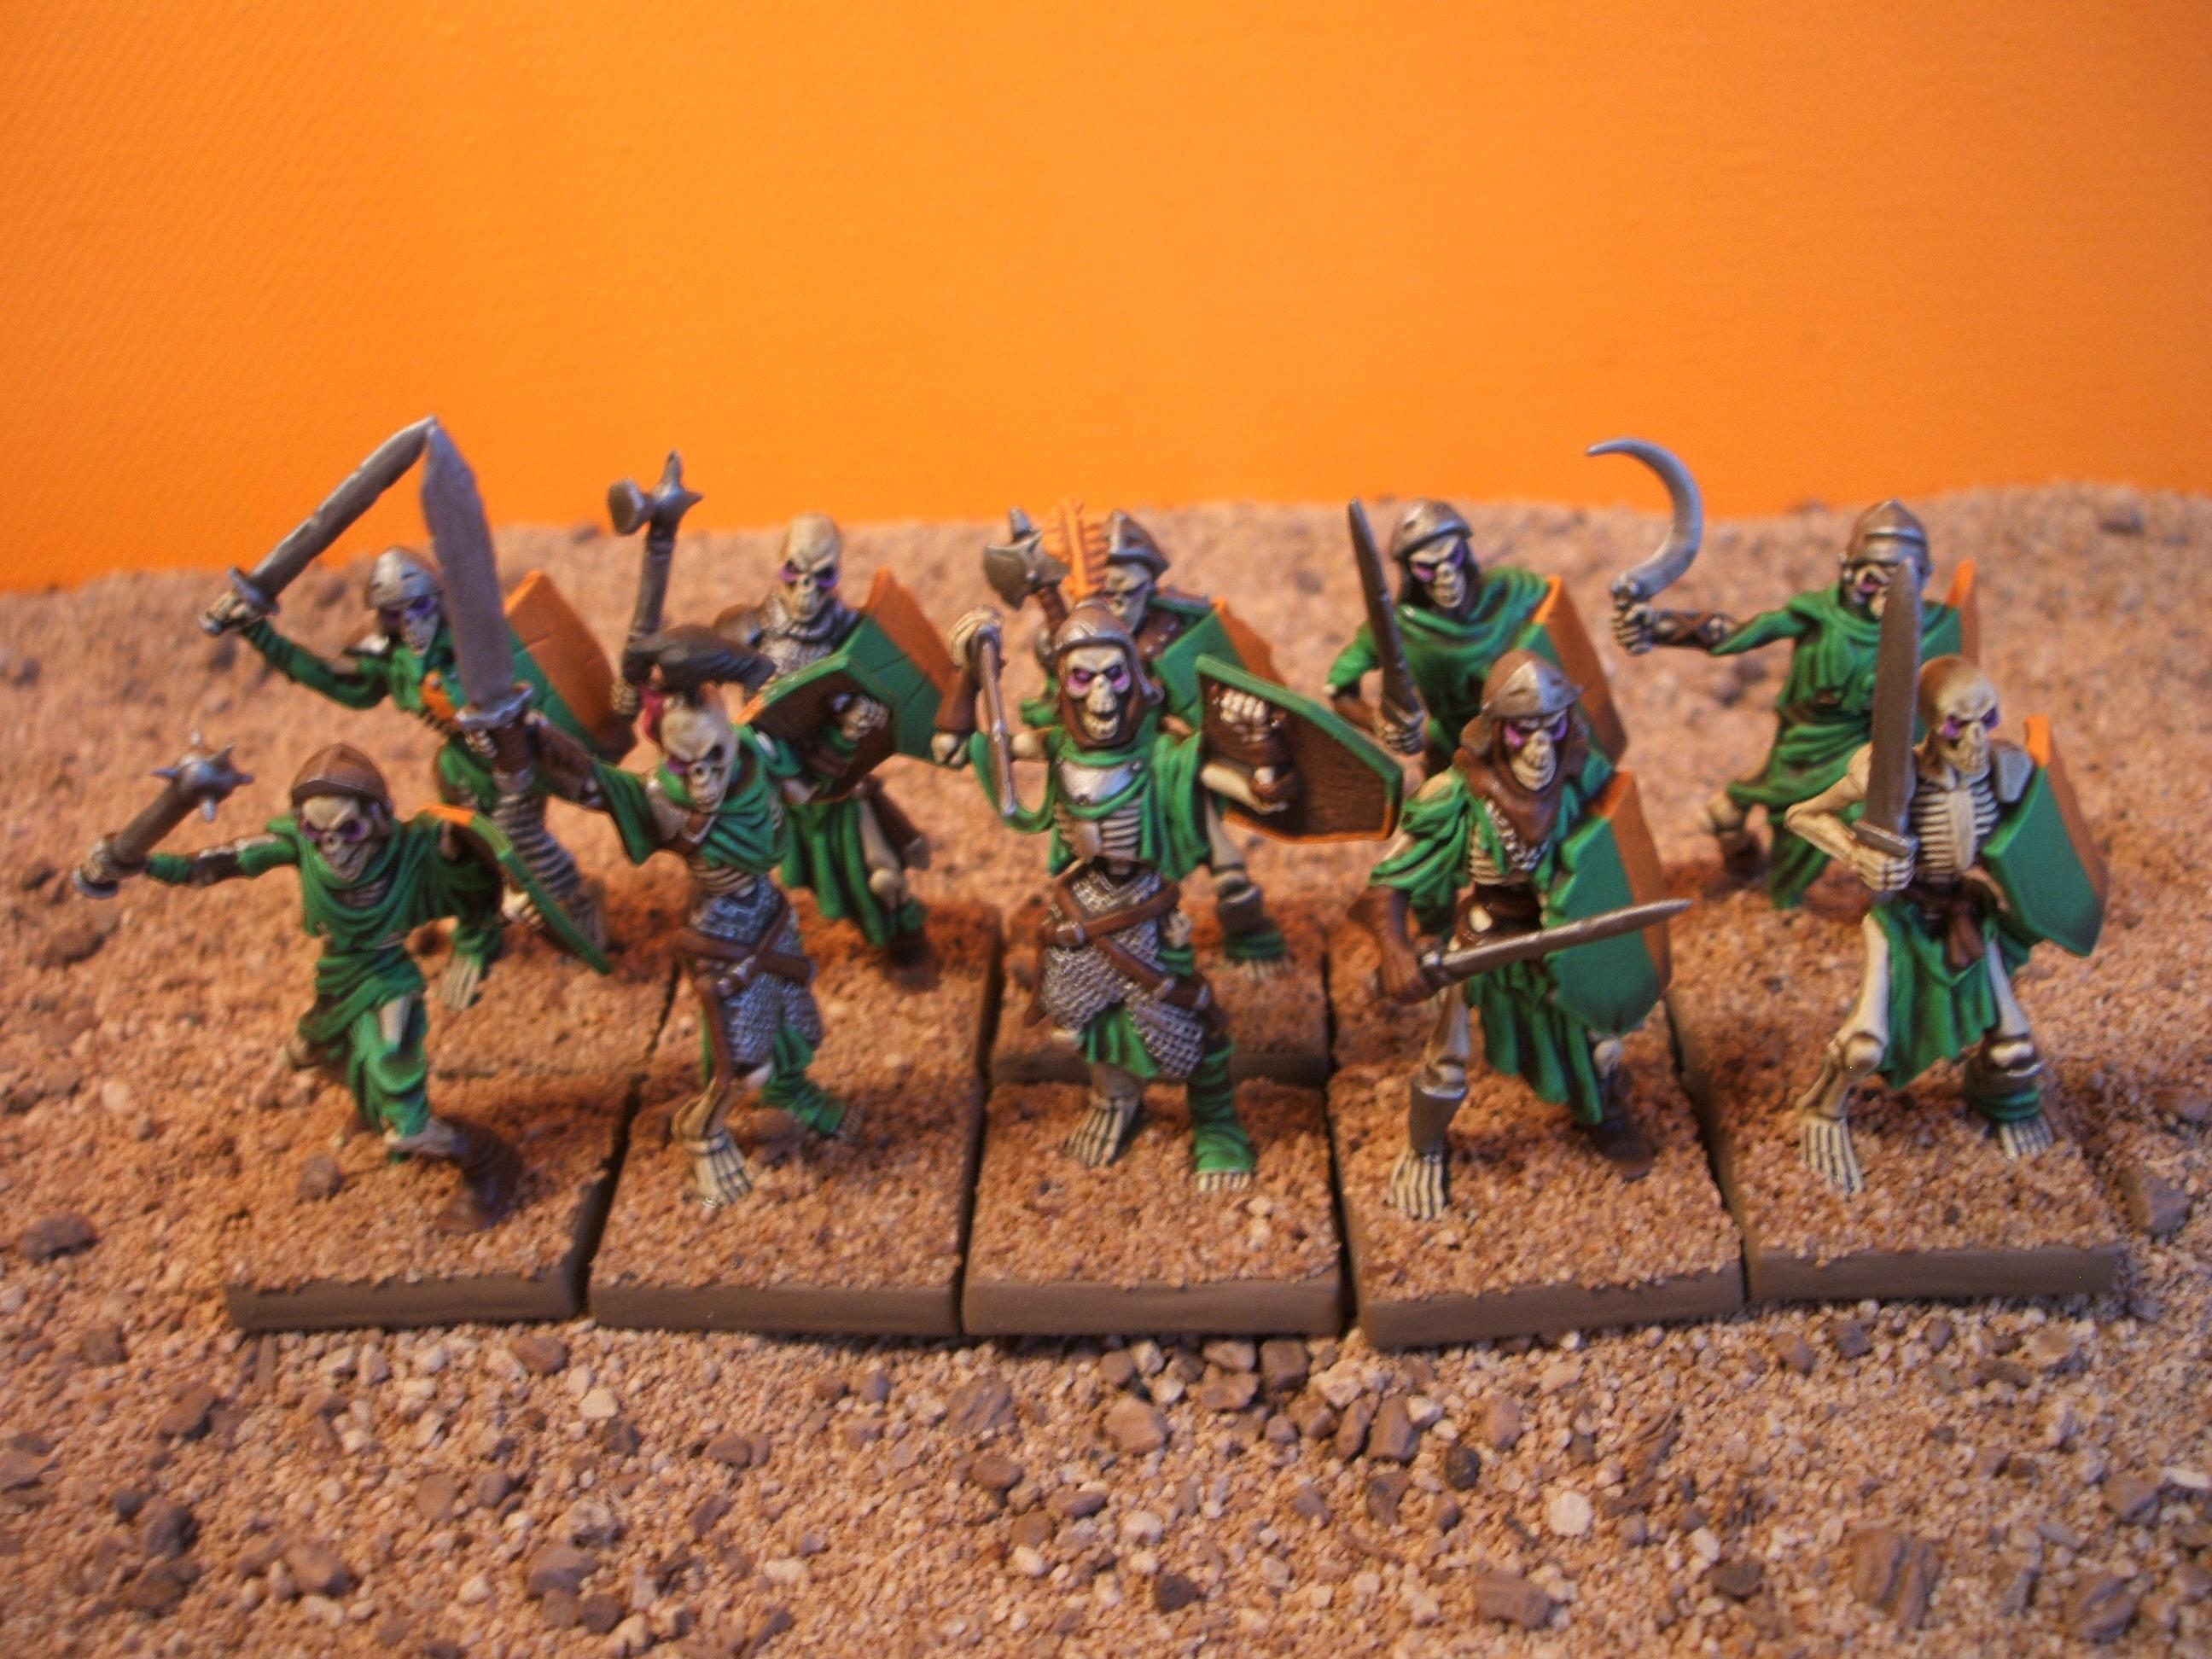 Desert, Dwarves, Elves, Kings Of War, Kow, Mantic, Mantic Games, Orcs, Quickshade, Undead